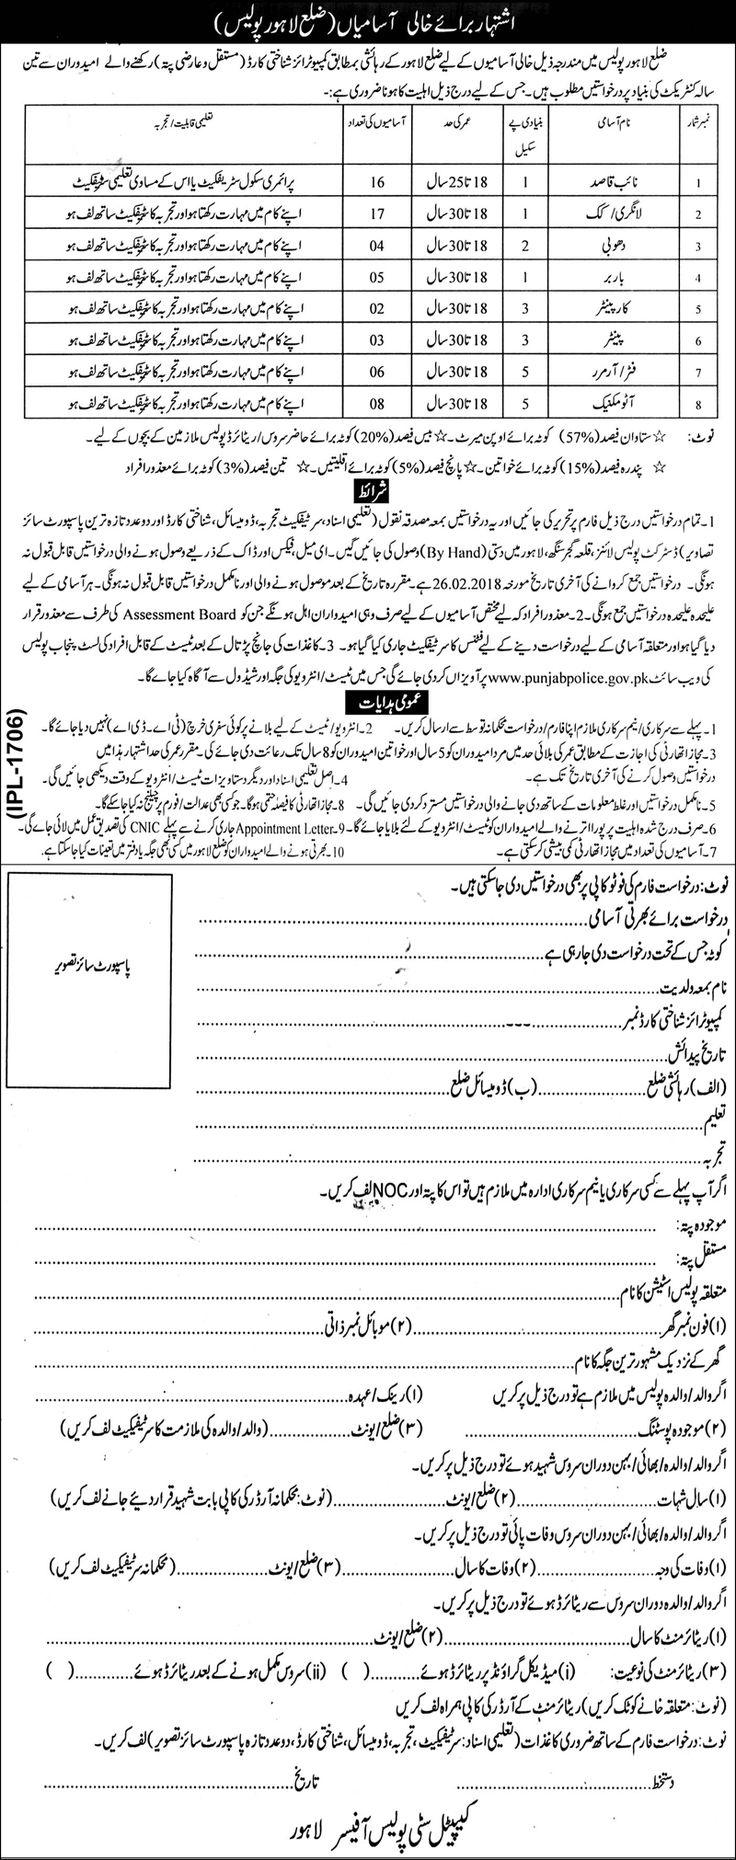 Punjab Police Jobs 2018 In Lahore For Naib Qasid And Cook https://www.jobsfanda.com/punjab-police-jobs-2018-lahore-naib-qasid-cook/